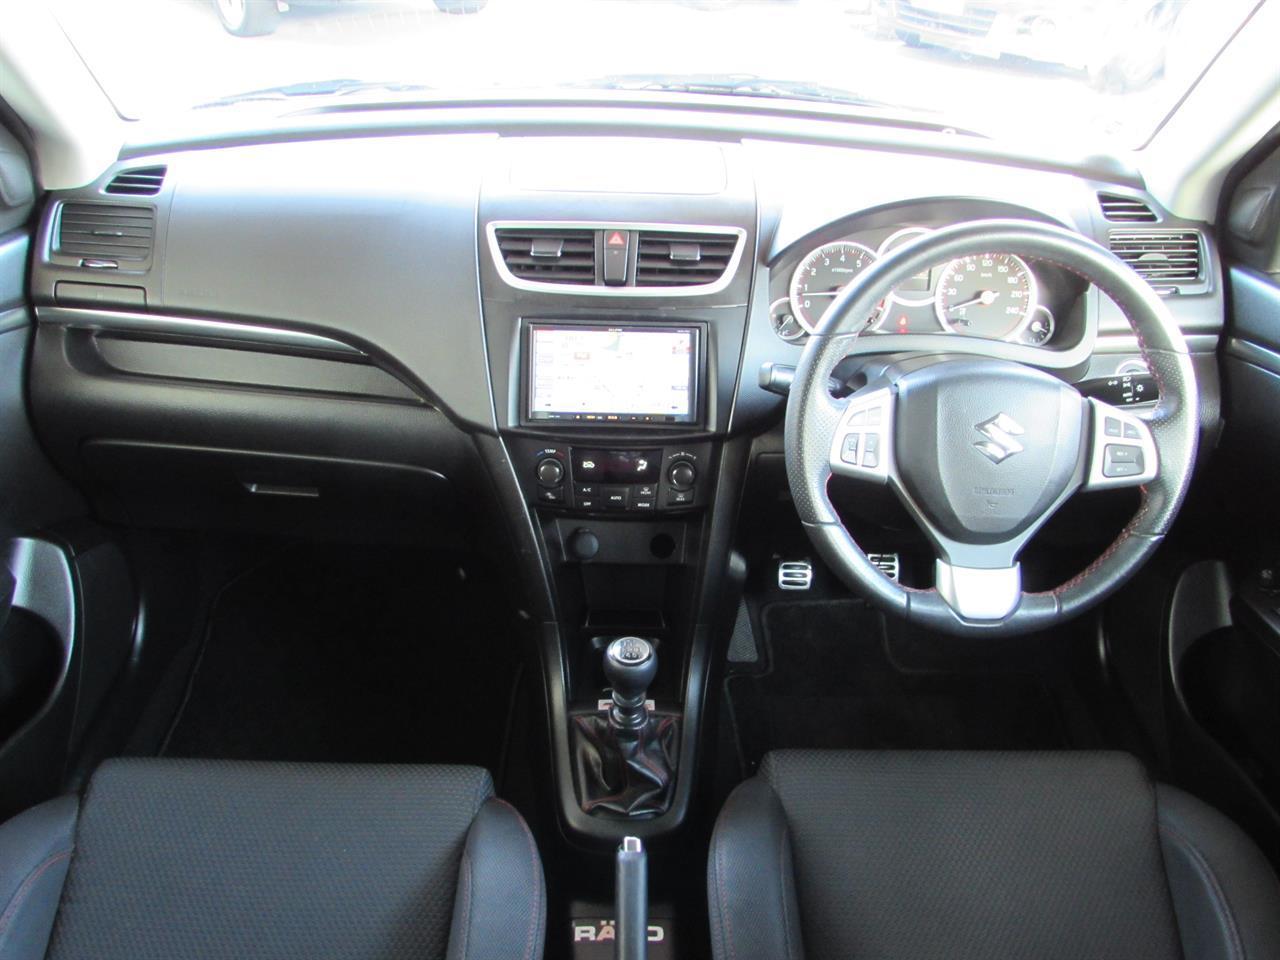 image-13, 2014 Suzuki SWIFT SPORTS at Christchurch